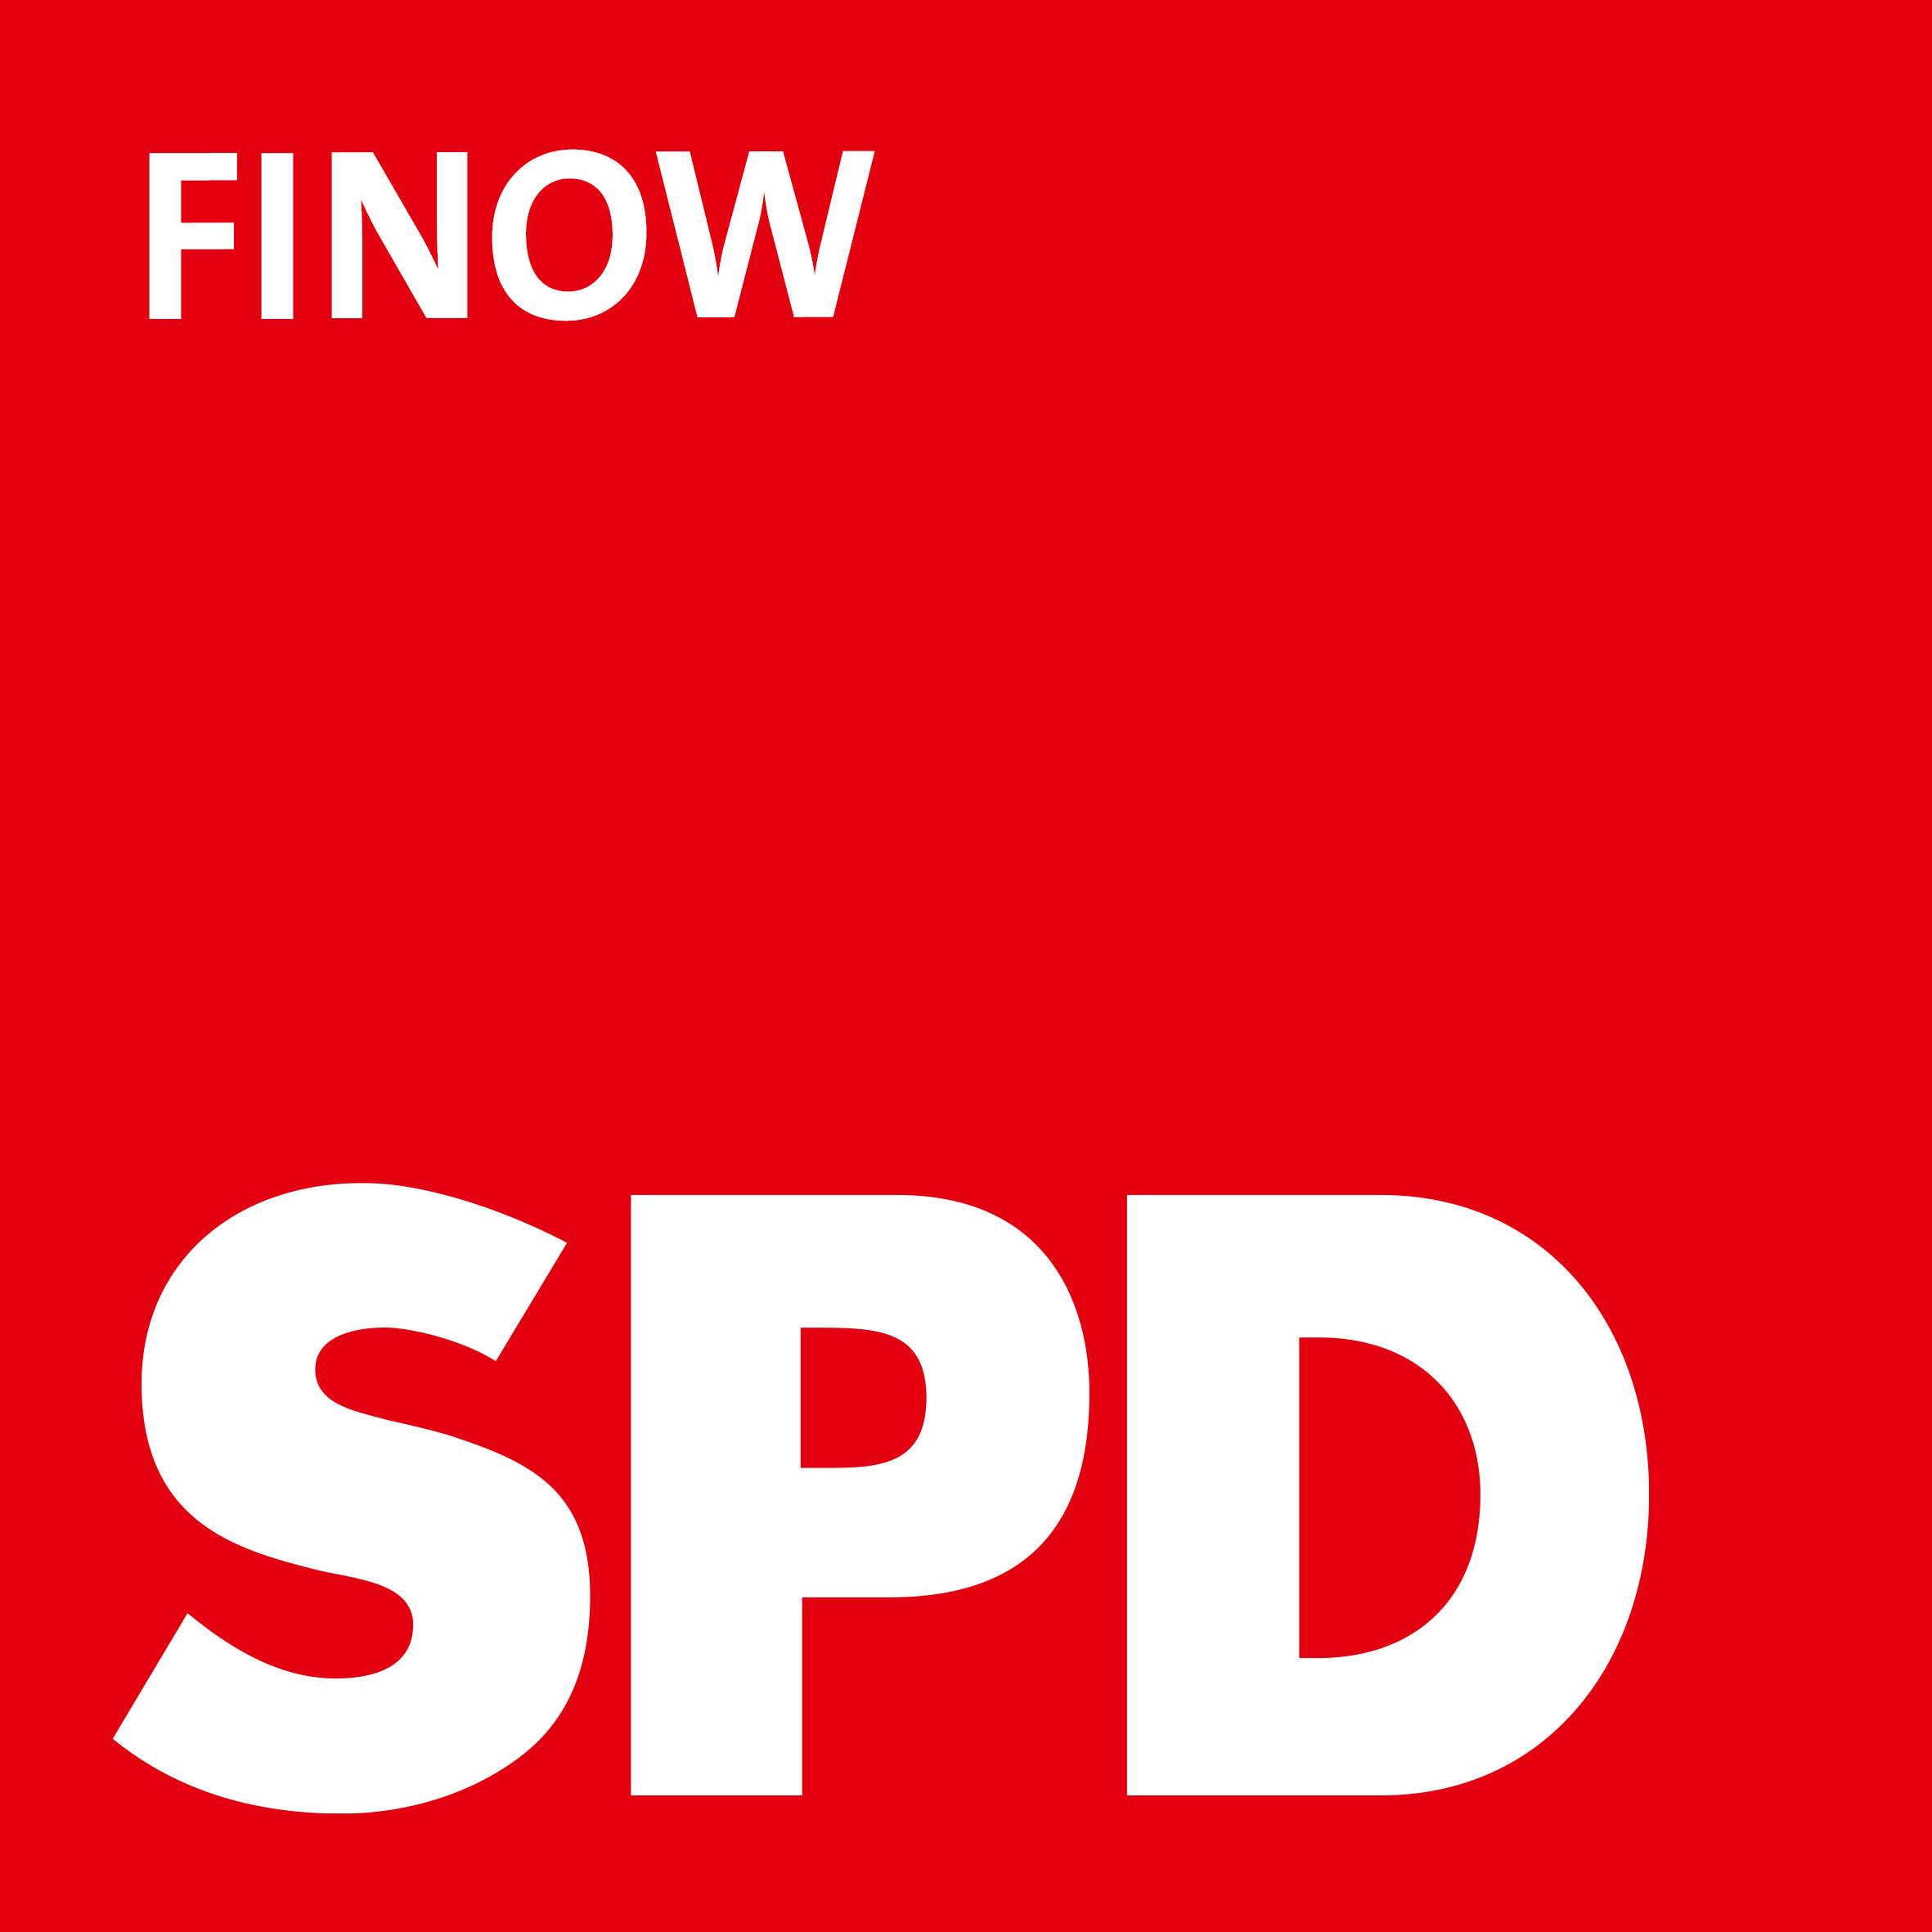 SPD Finow